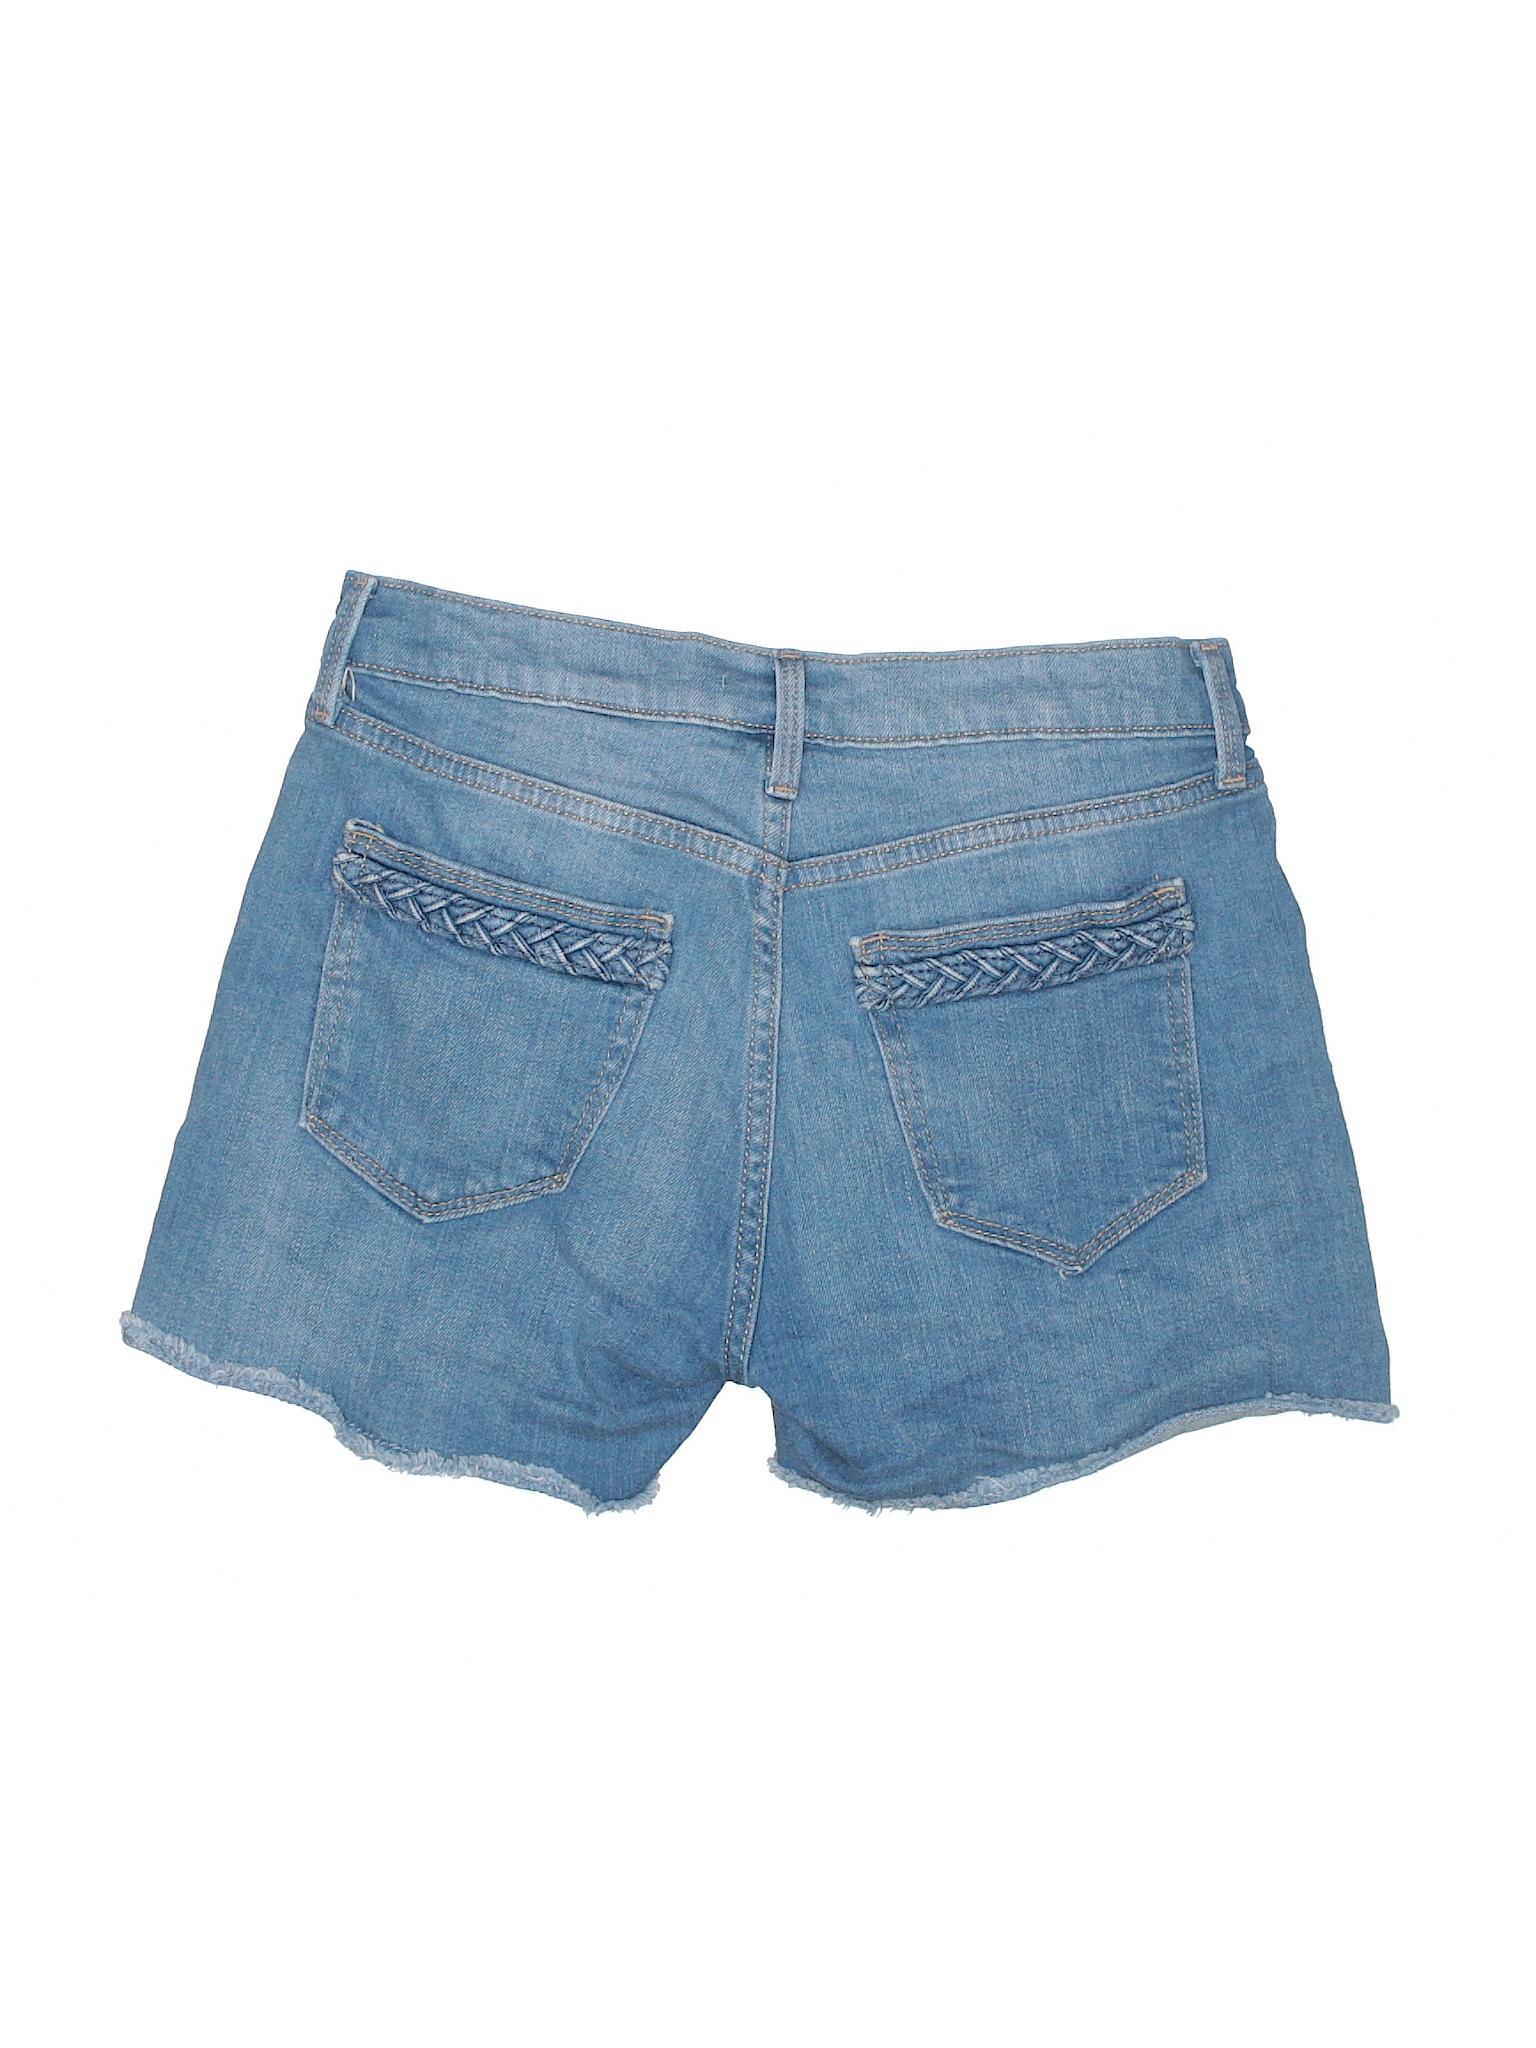 Boutique Boutique Gap Shorts Denim Gap vqBq5O